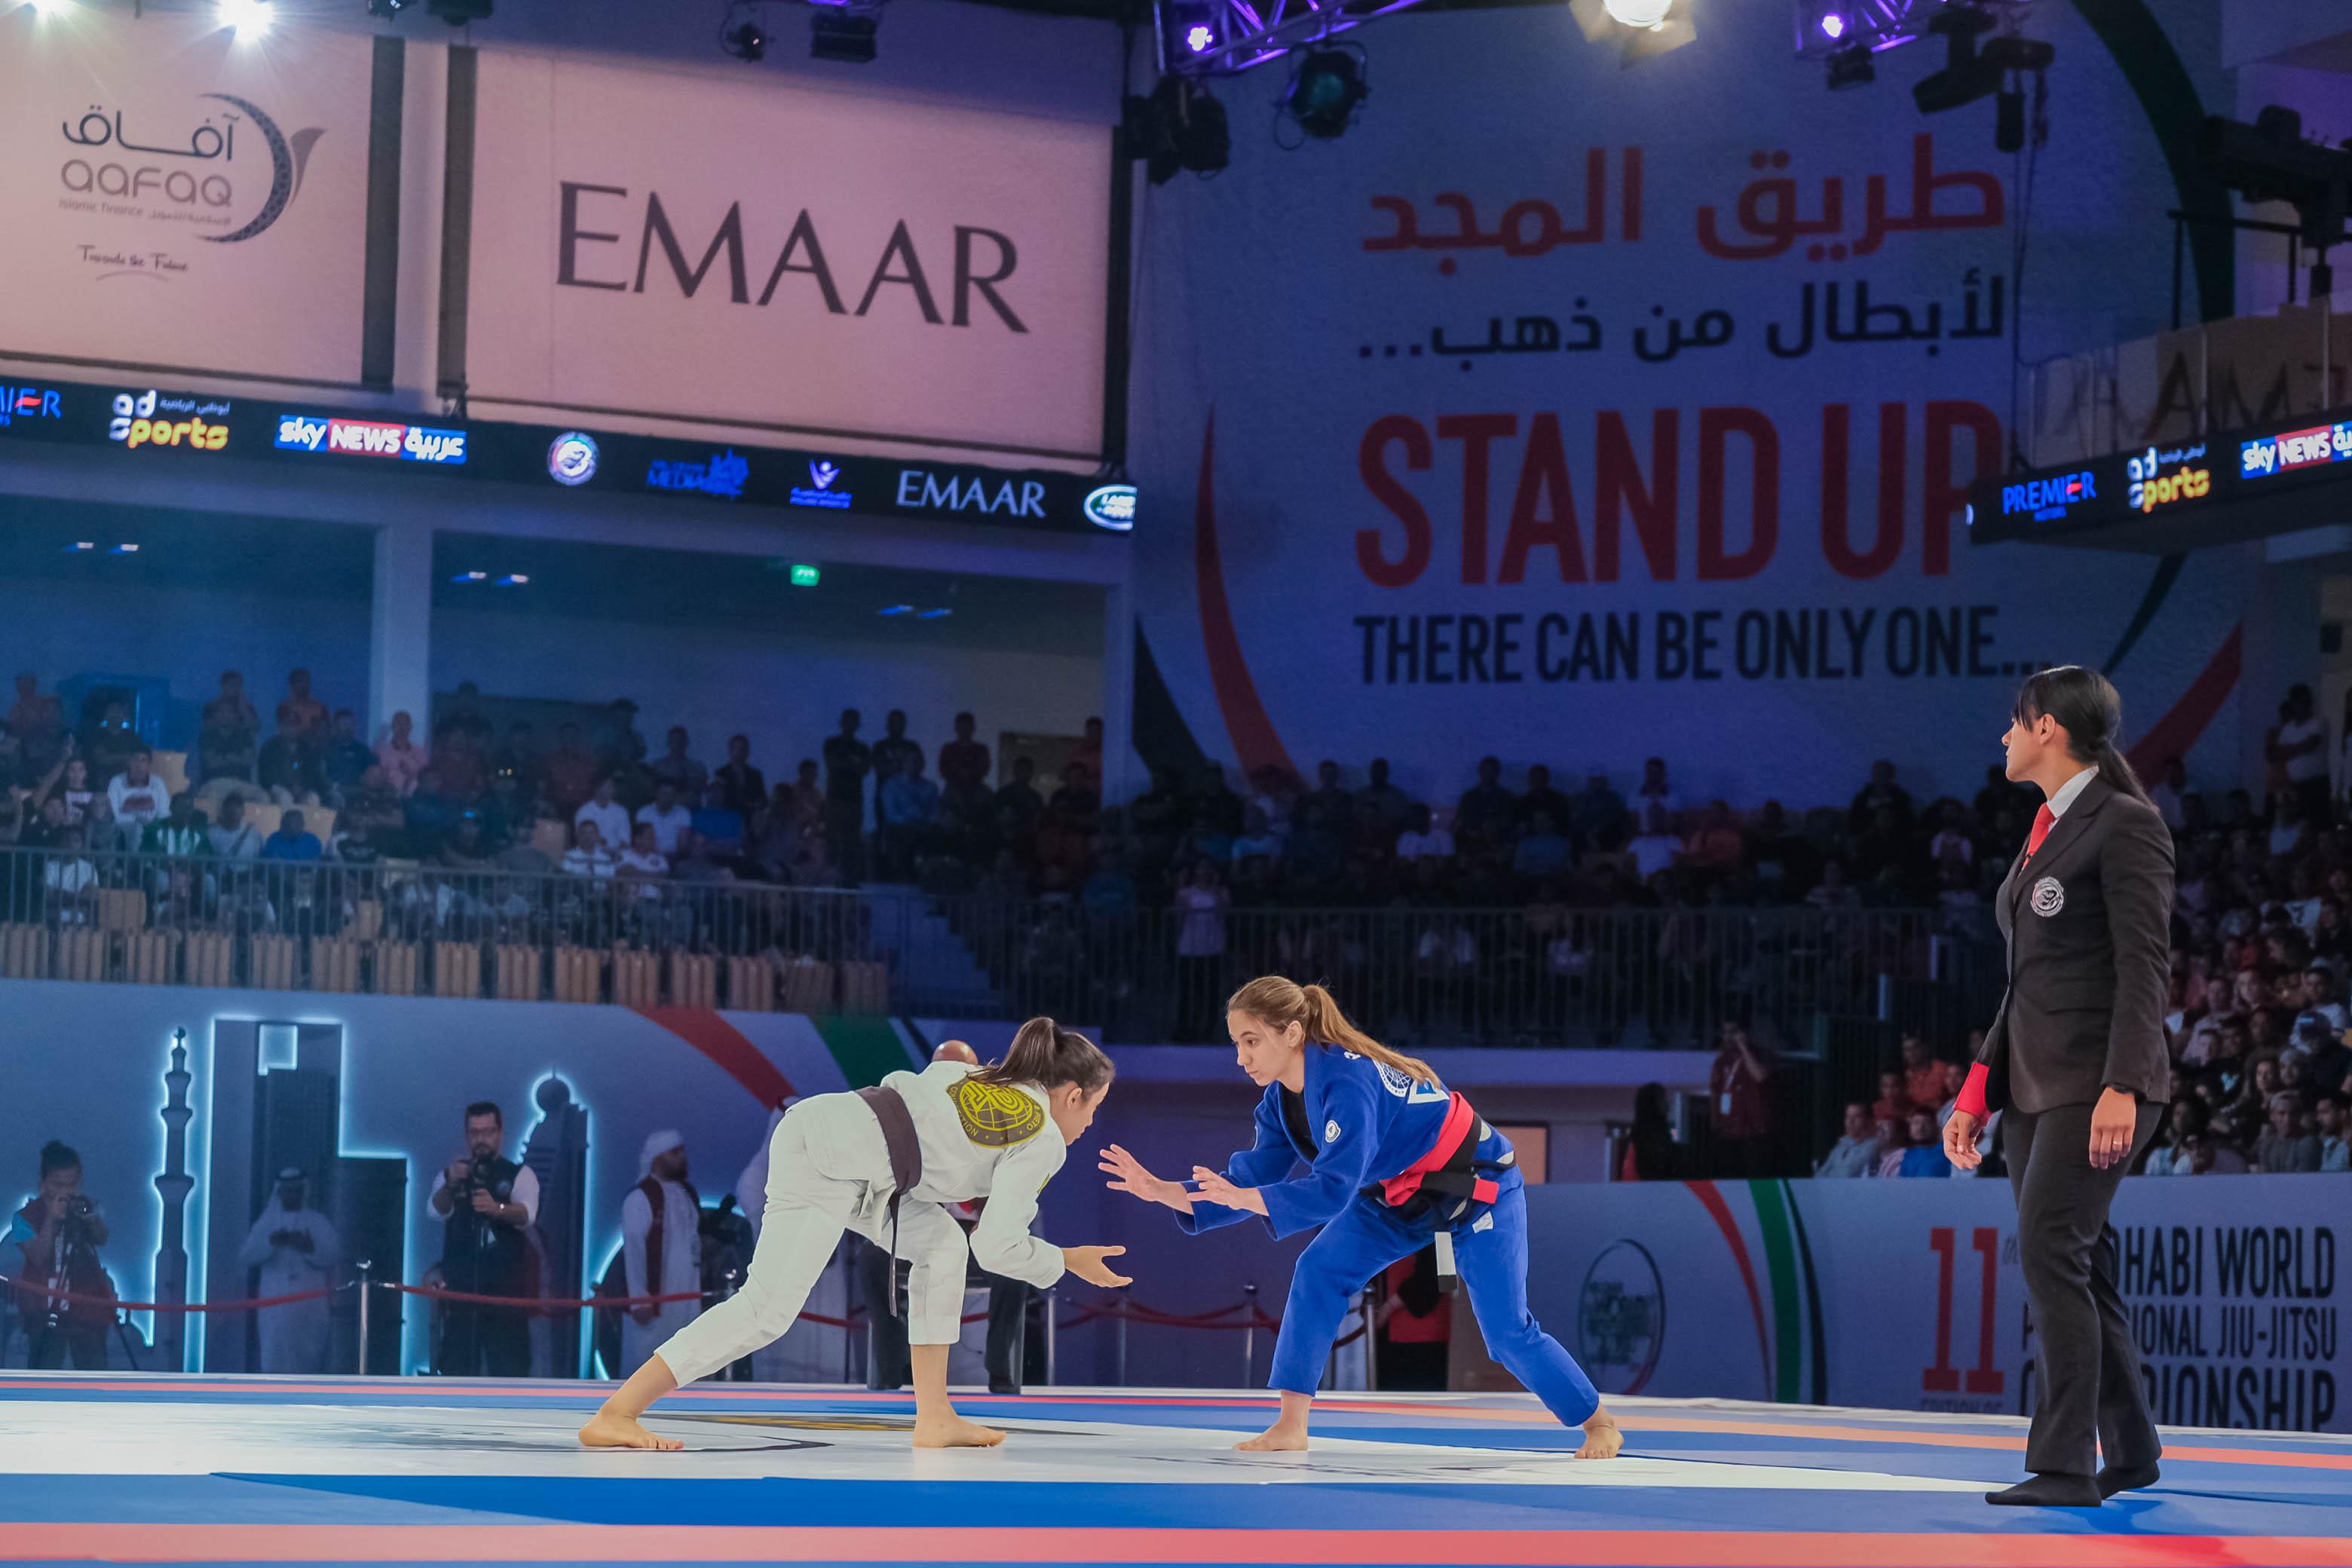 global athletes to partake in abu dhabi world professional jiu-jitsu championship in april 4